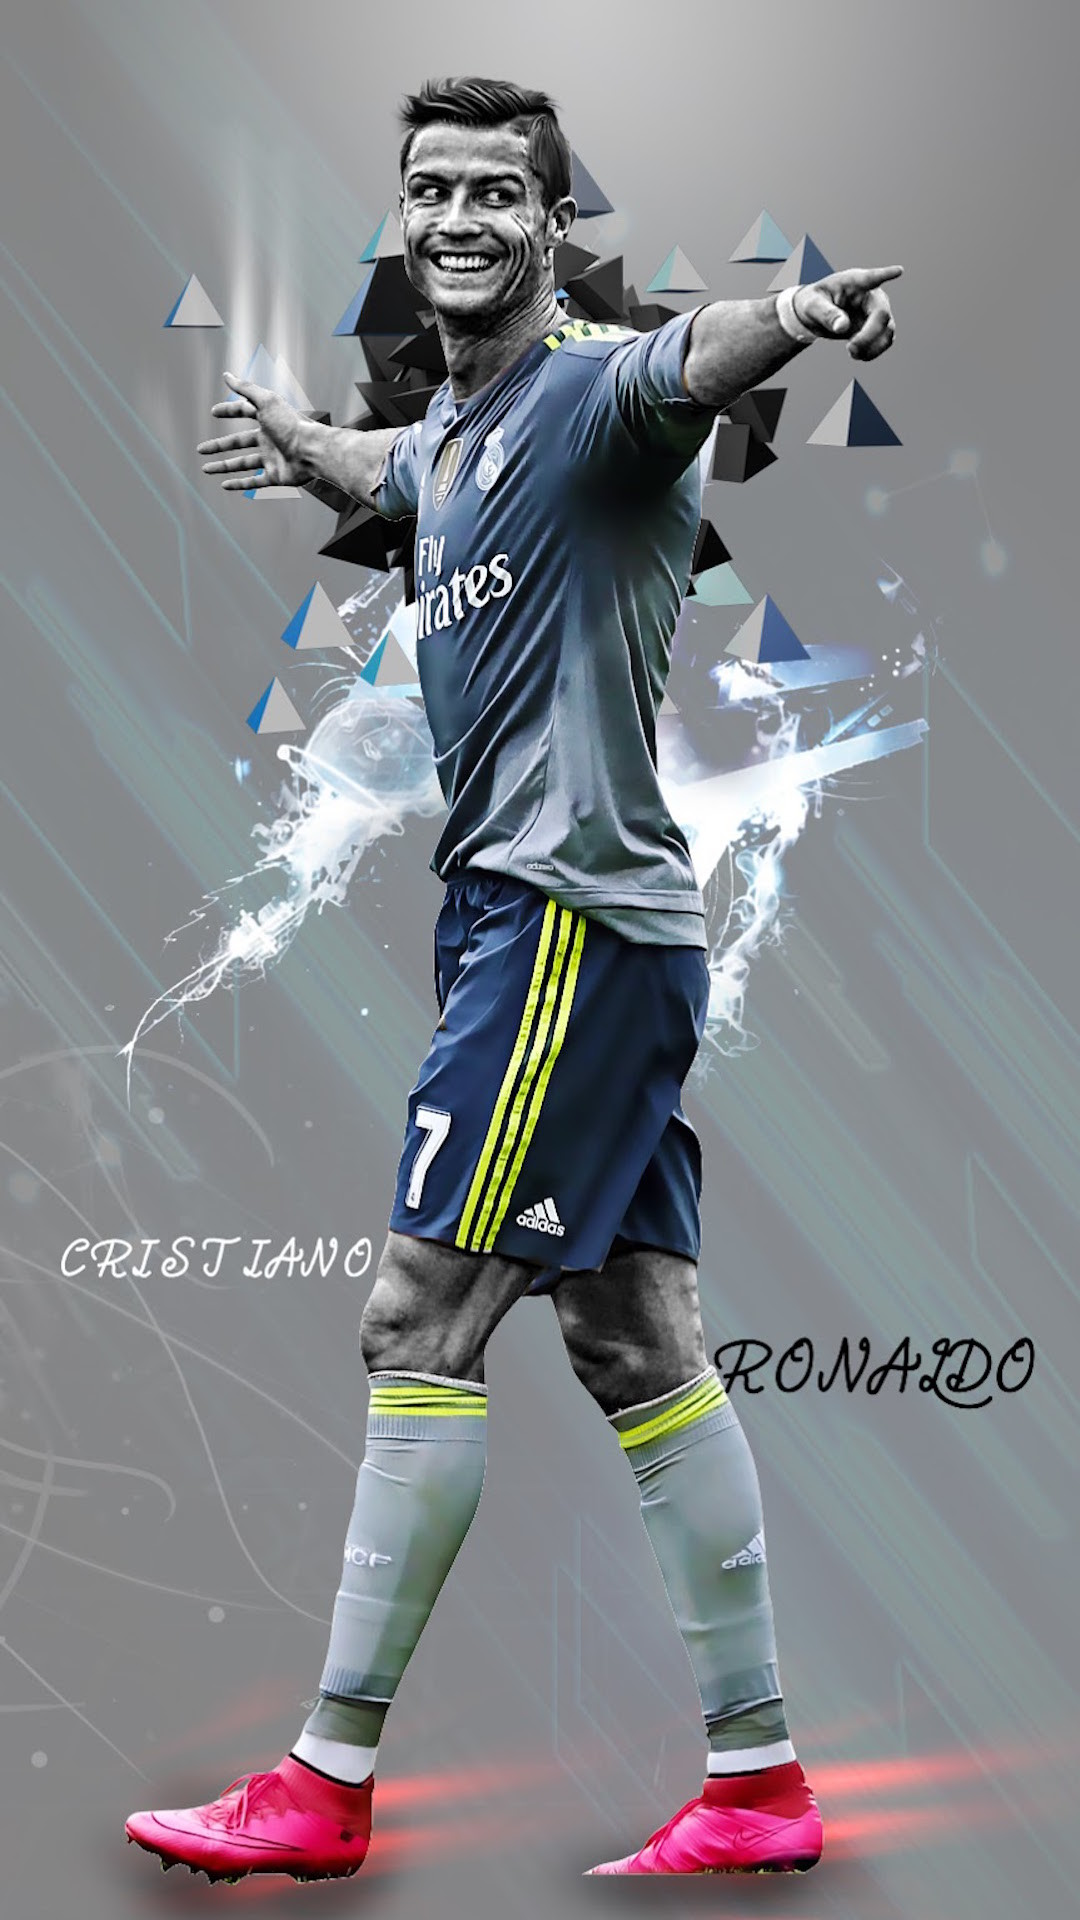 1080x1920 Hd Wallpaper Portrait Cristiano Ronaldo Wallpaper 2018 Nike 61 Images